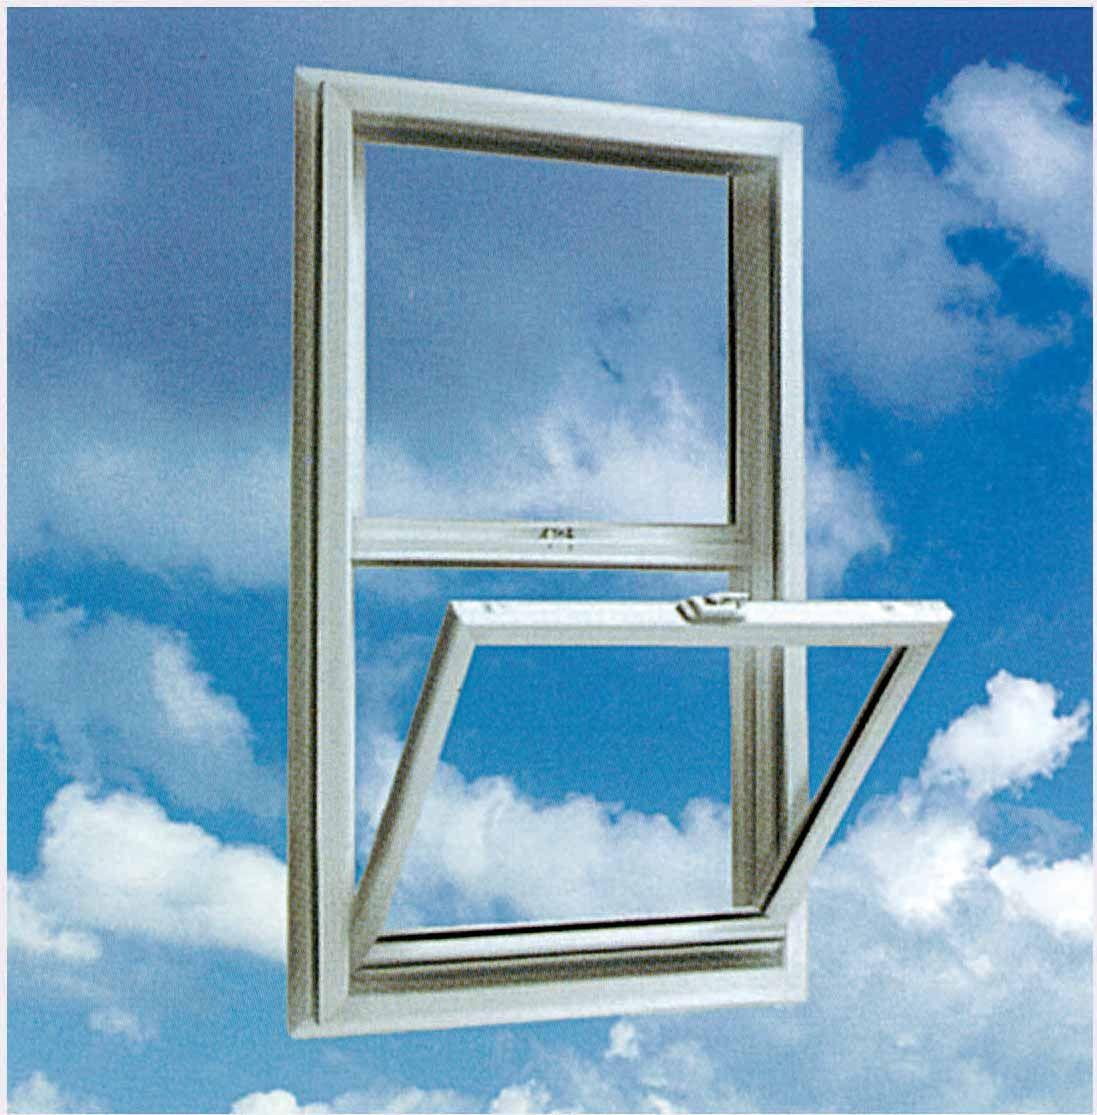 Best value replacement windows - Window